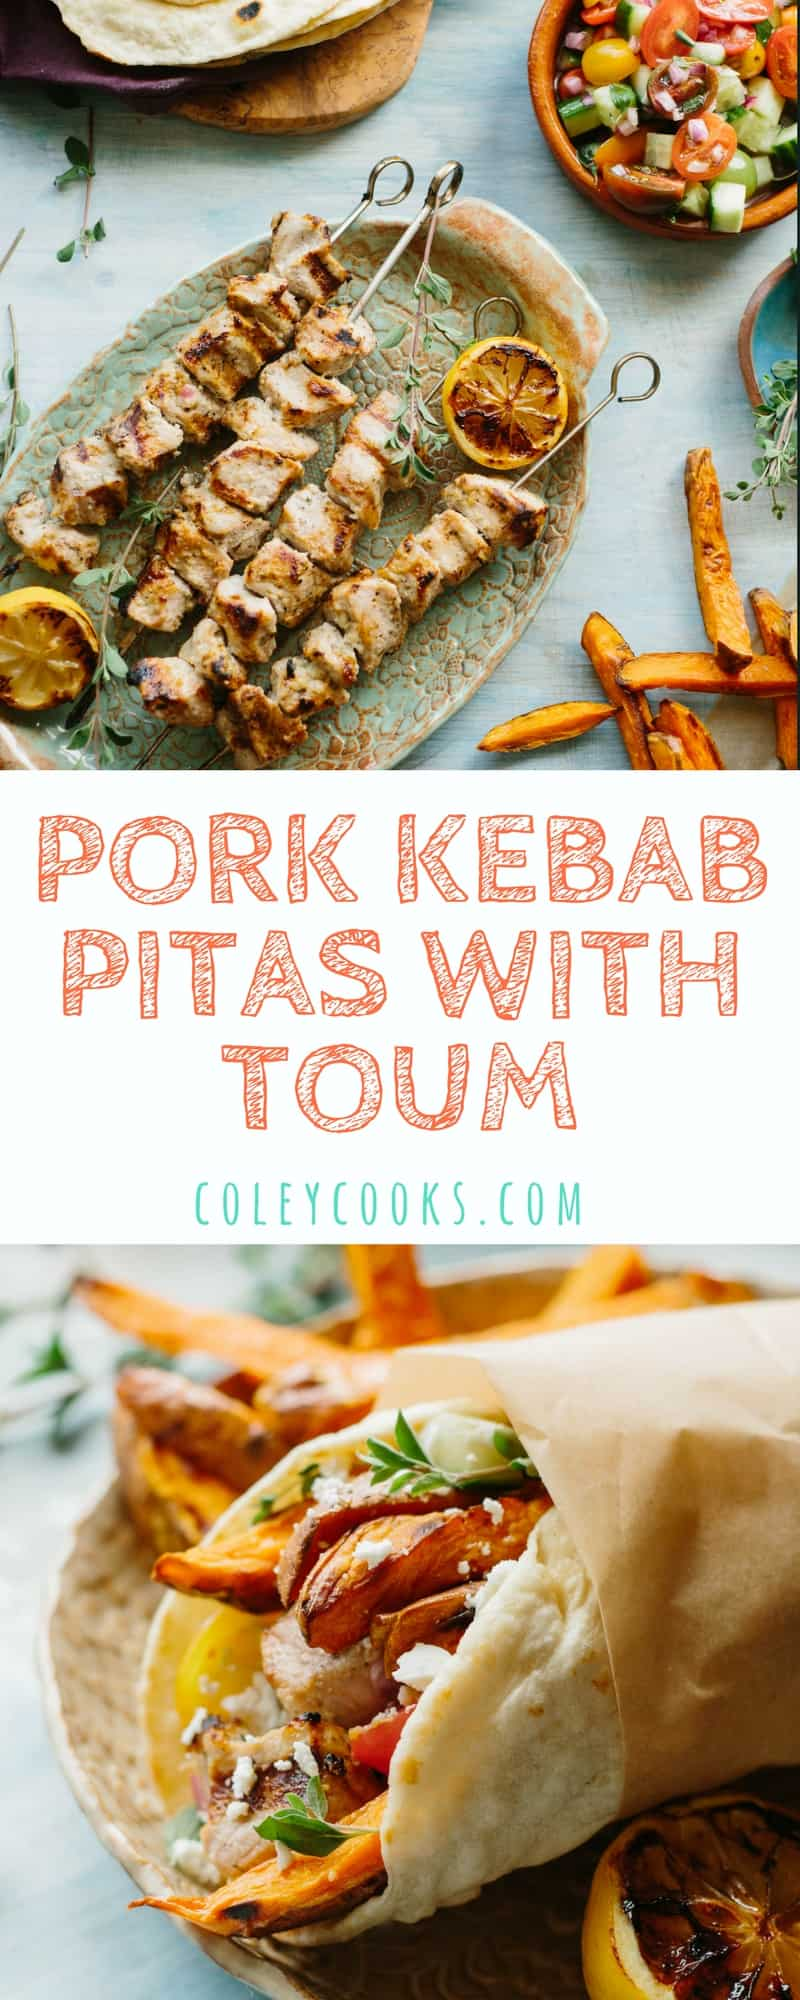 PORK KEBAB PITAS WITH TOUM   Tender Pitas Stuffed with Marinated Pork, Sweet Potato Fries, Tomato Cucumber Salad and a Garlicky Lebanese Sauce called Toum.   ColeyCooks.com